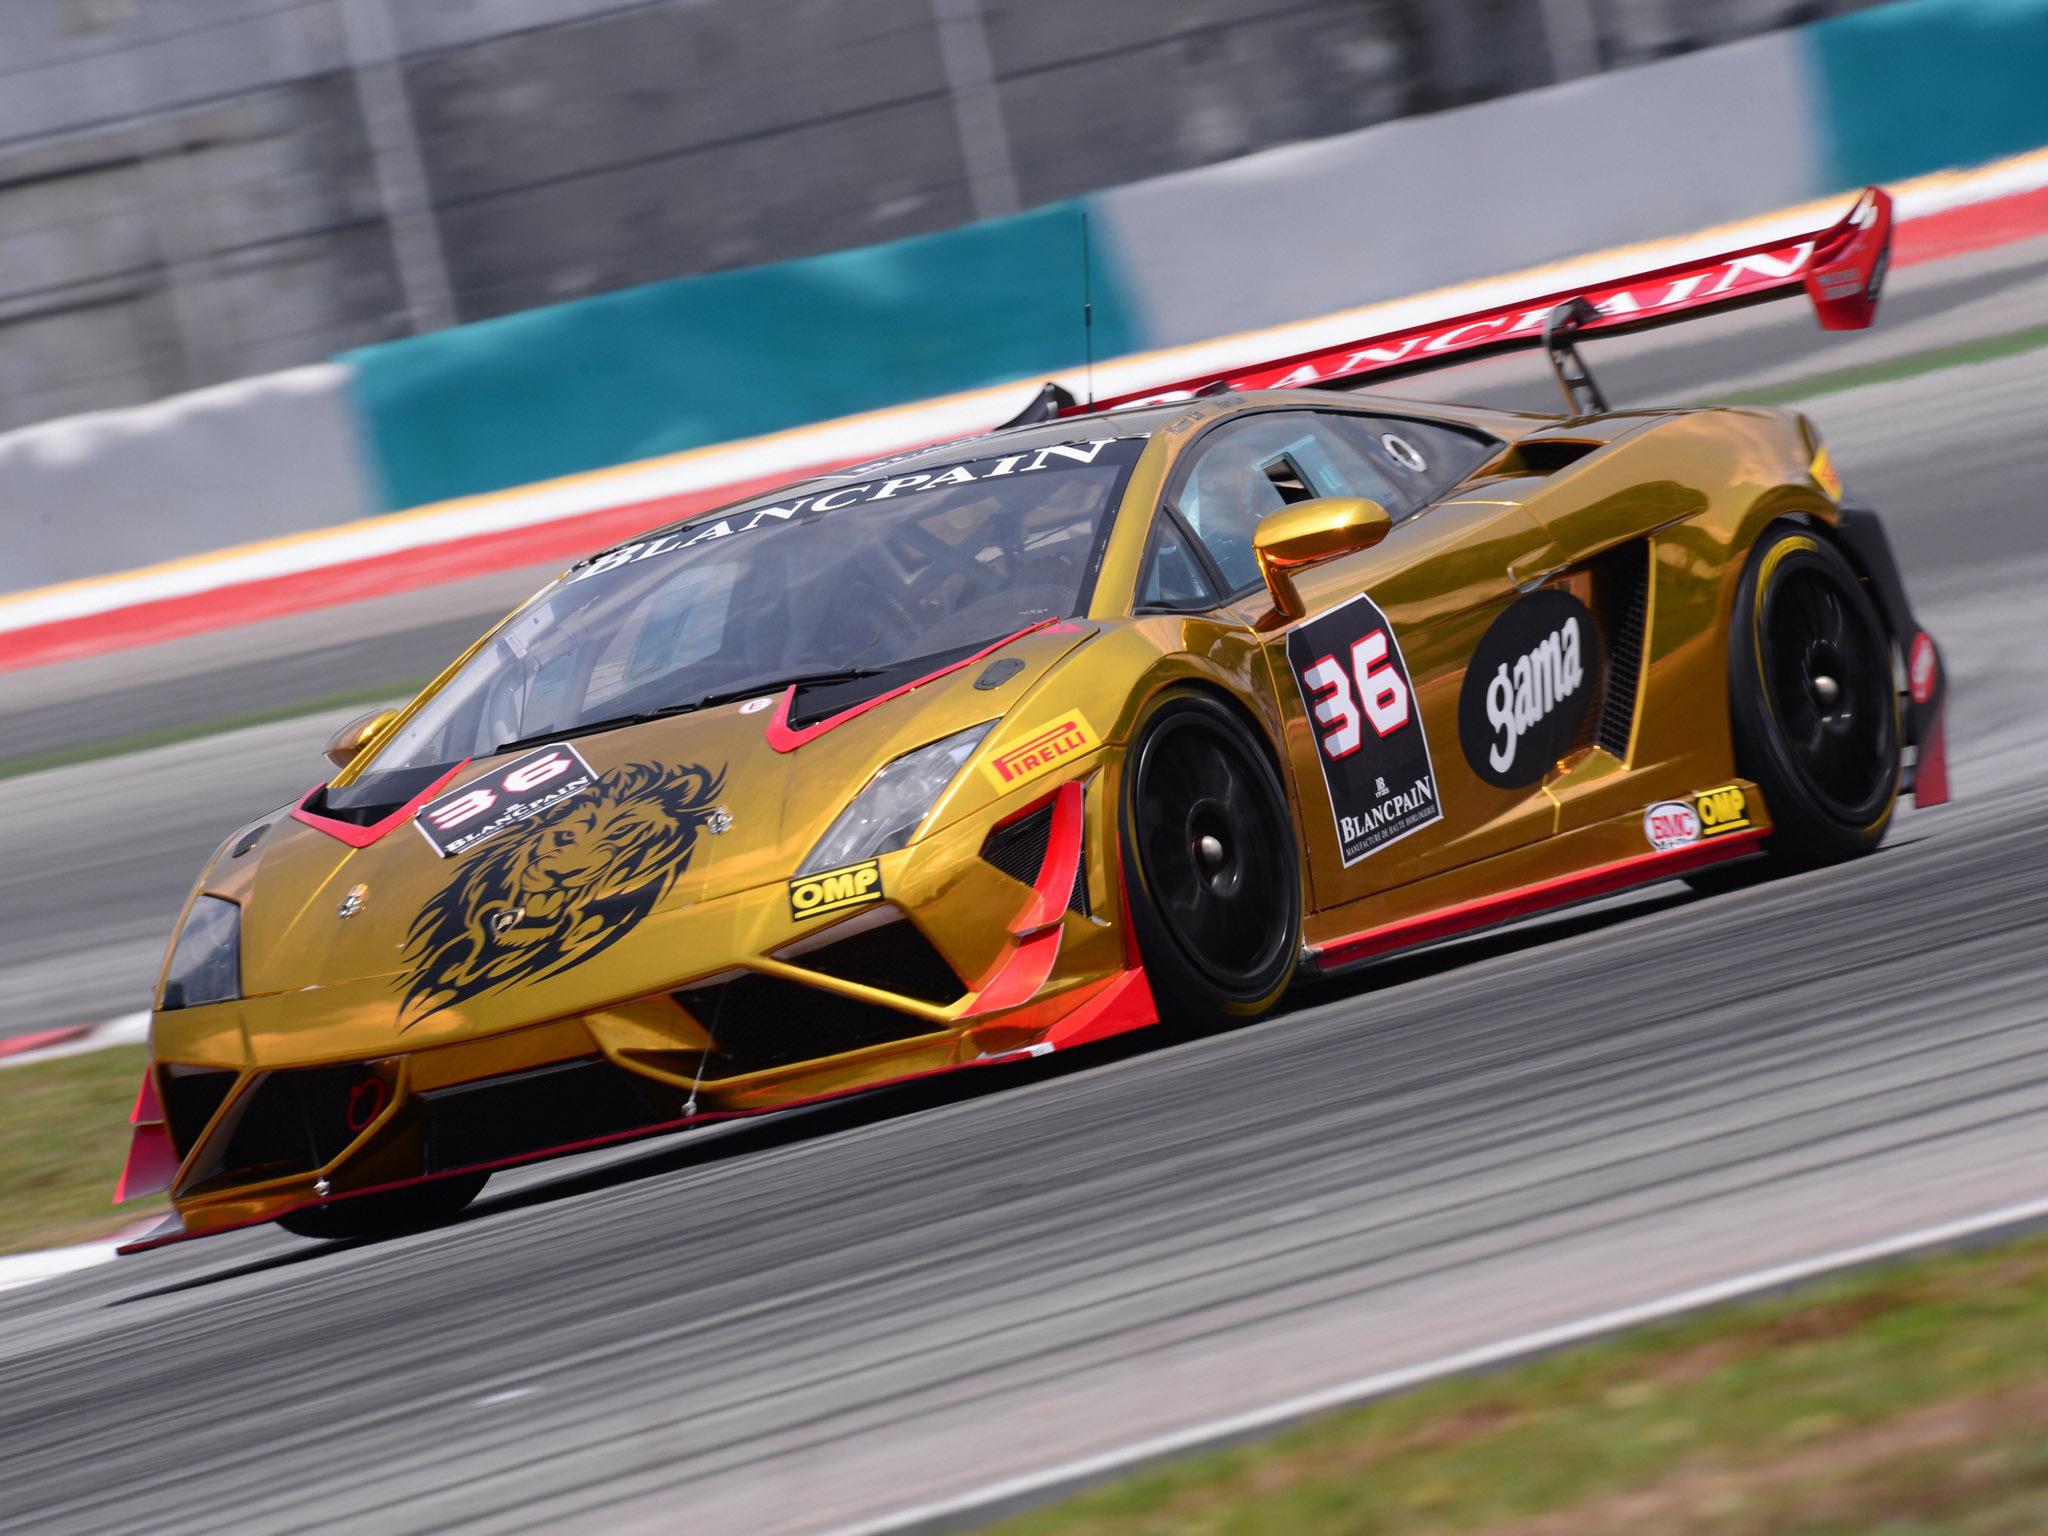 Super Car Racing >> 2013 Lamborghini Gallardo Lp570 4 Super Trofeo Supercar